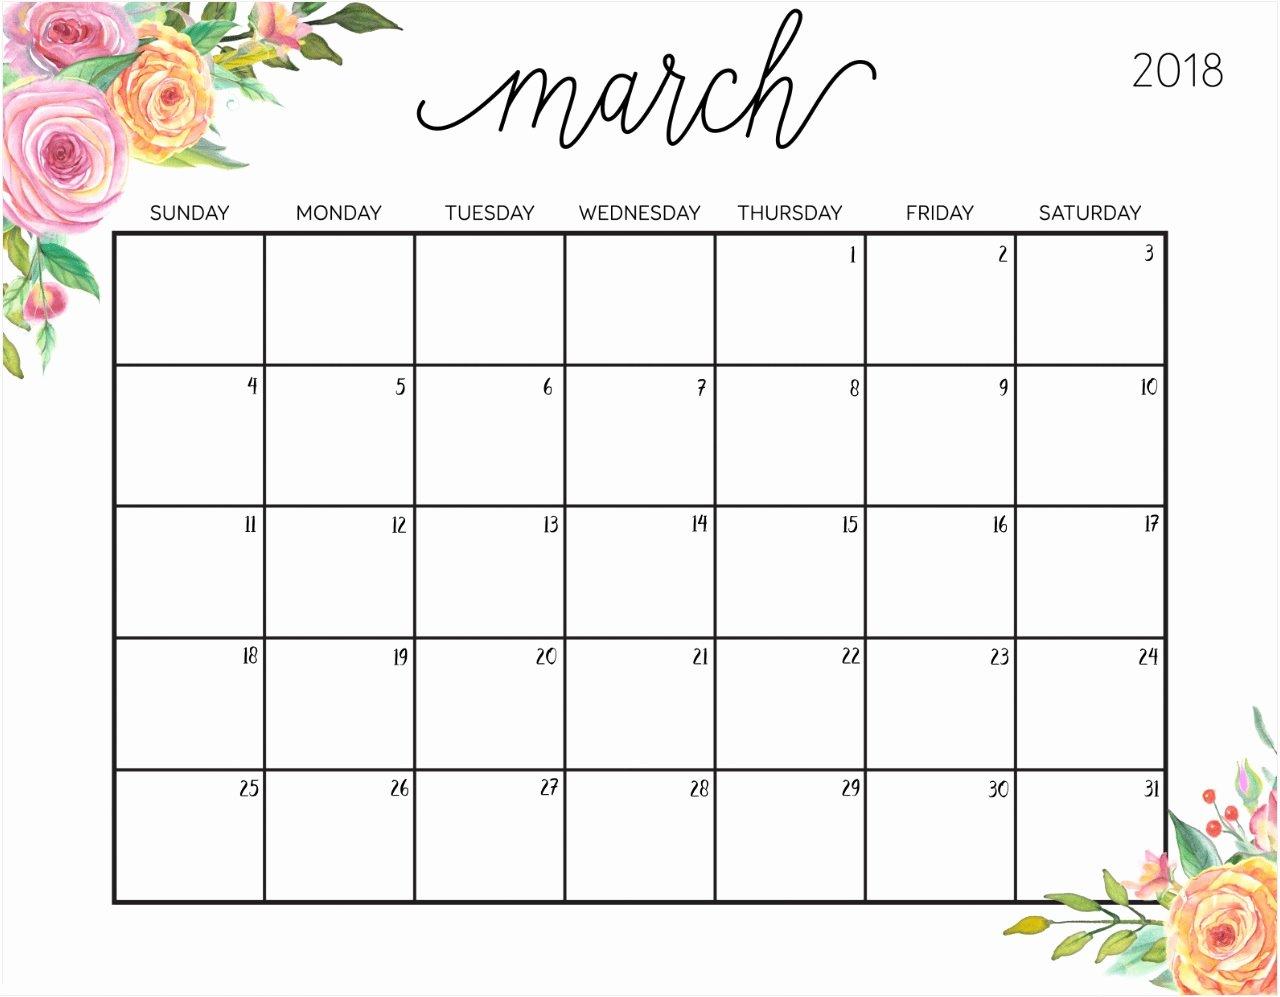 Free Printable 2018 Calendar with Weekly Planner